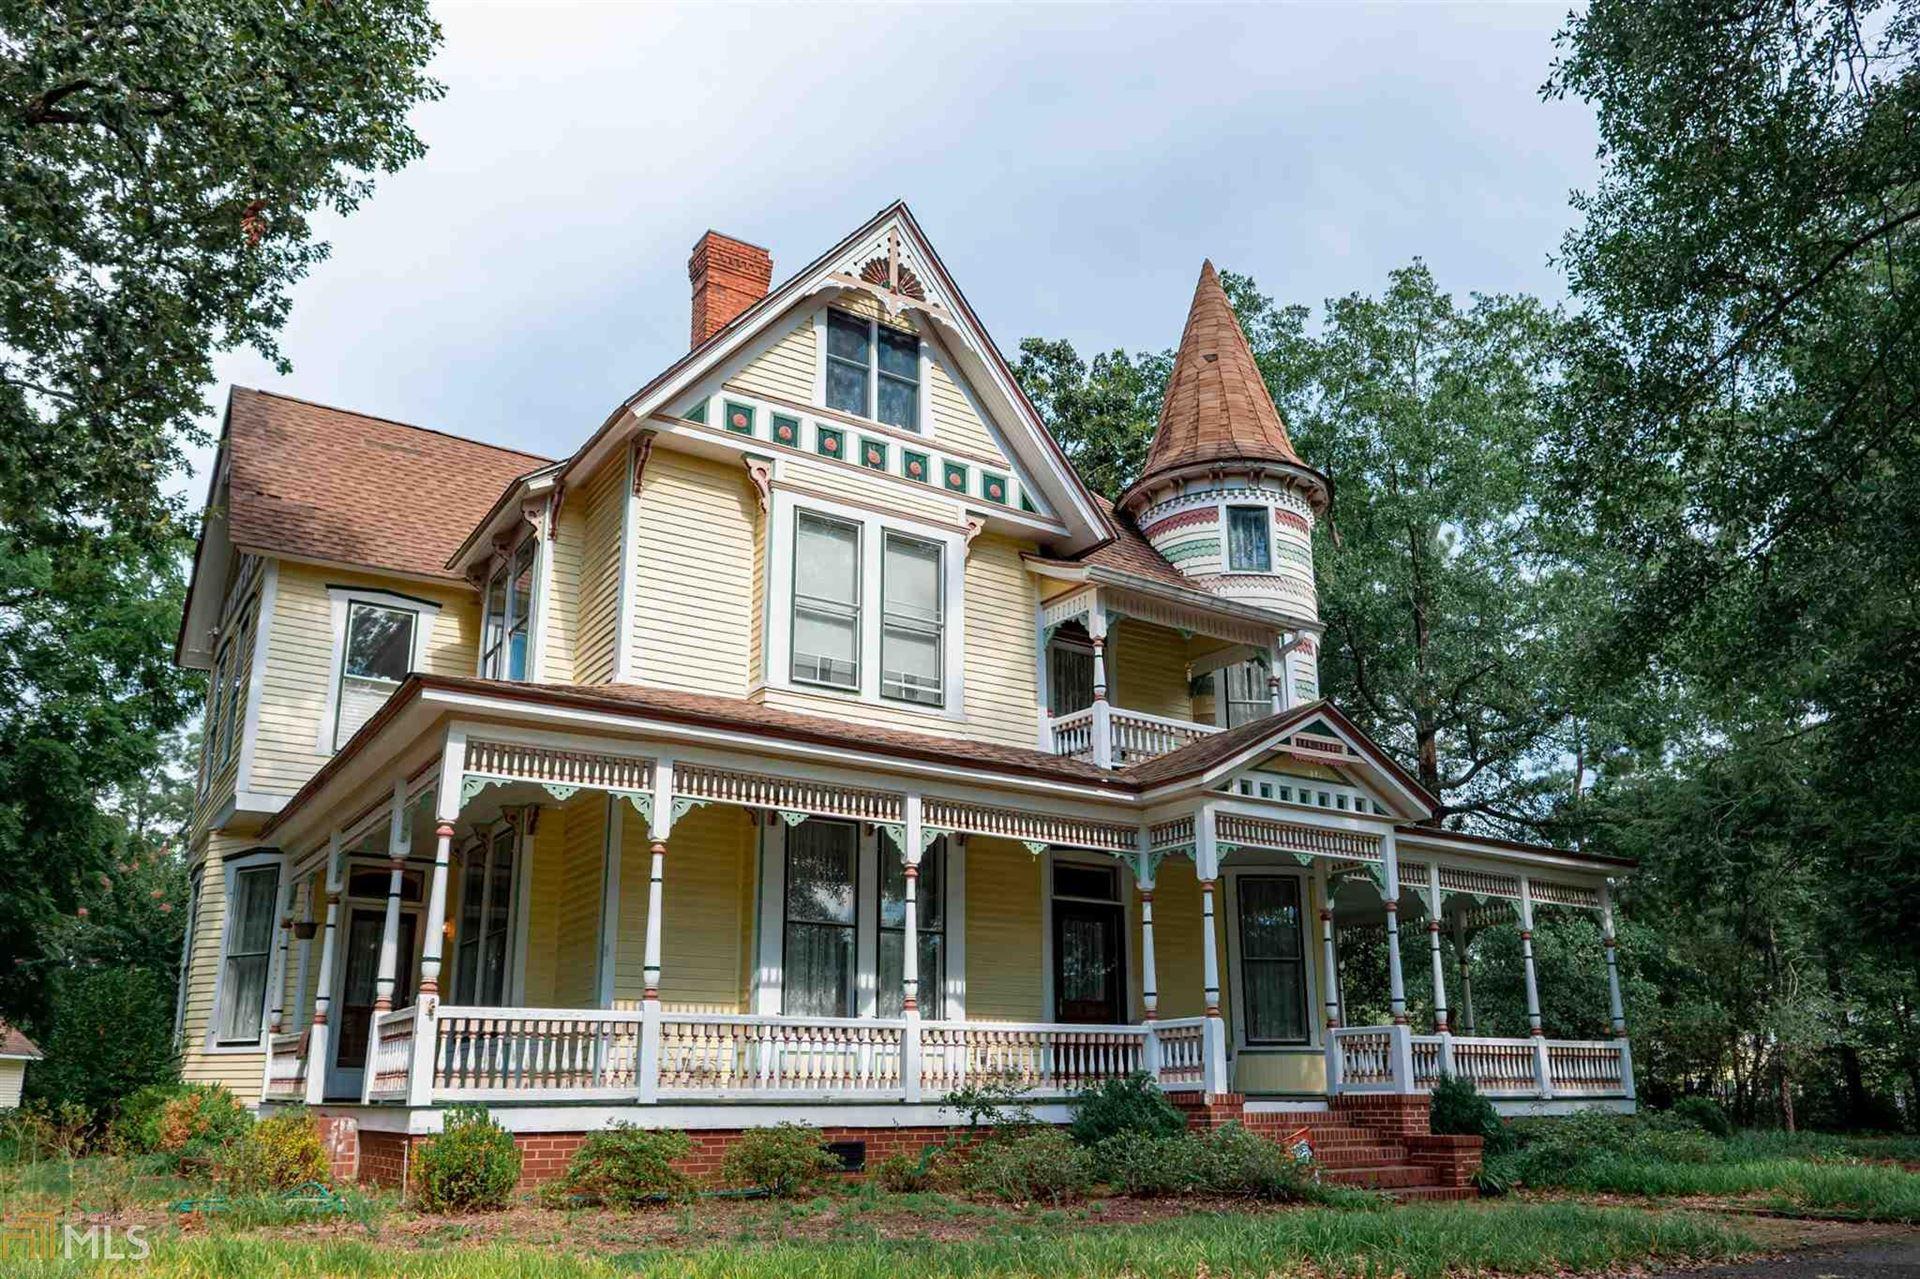 159 Benson St, Hartwell, GA 30643 - MLS#: 8839354